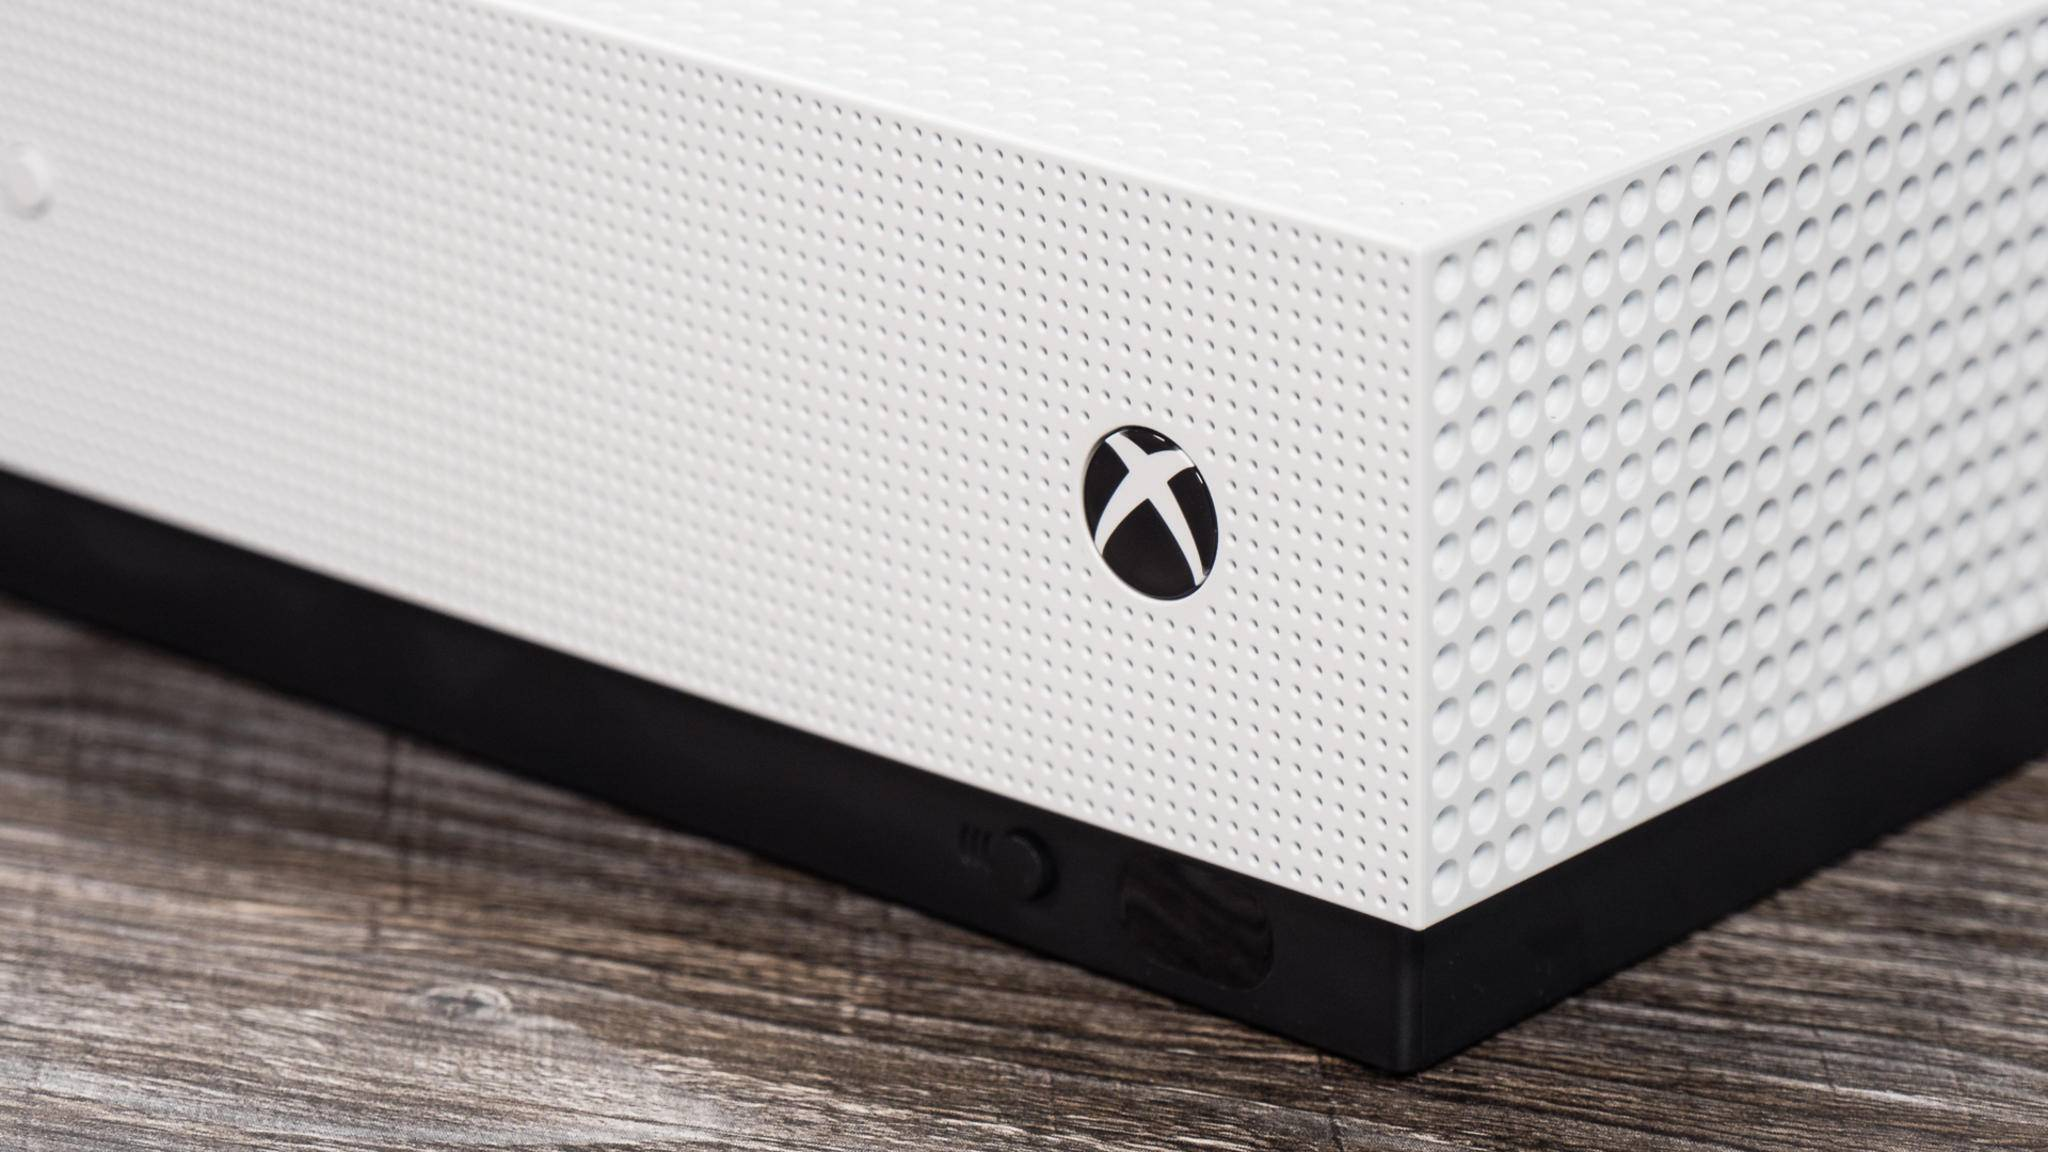 Unterstützt bald auch Freesync: Microsofts Xbox One S.